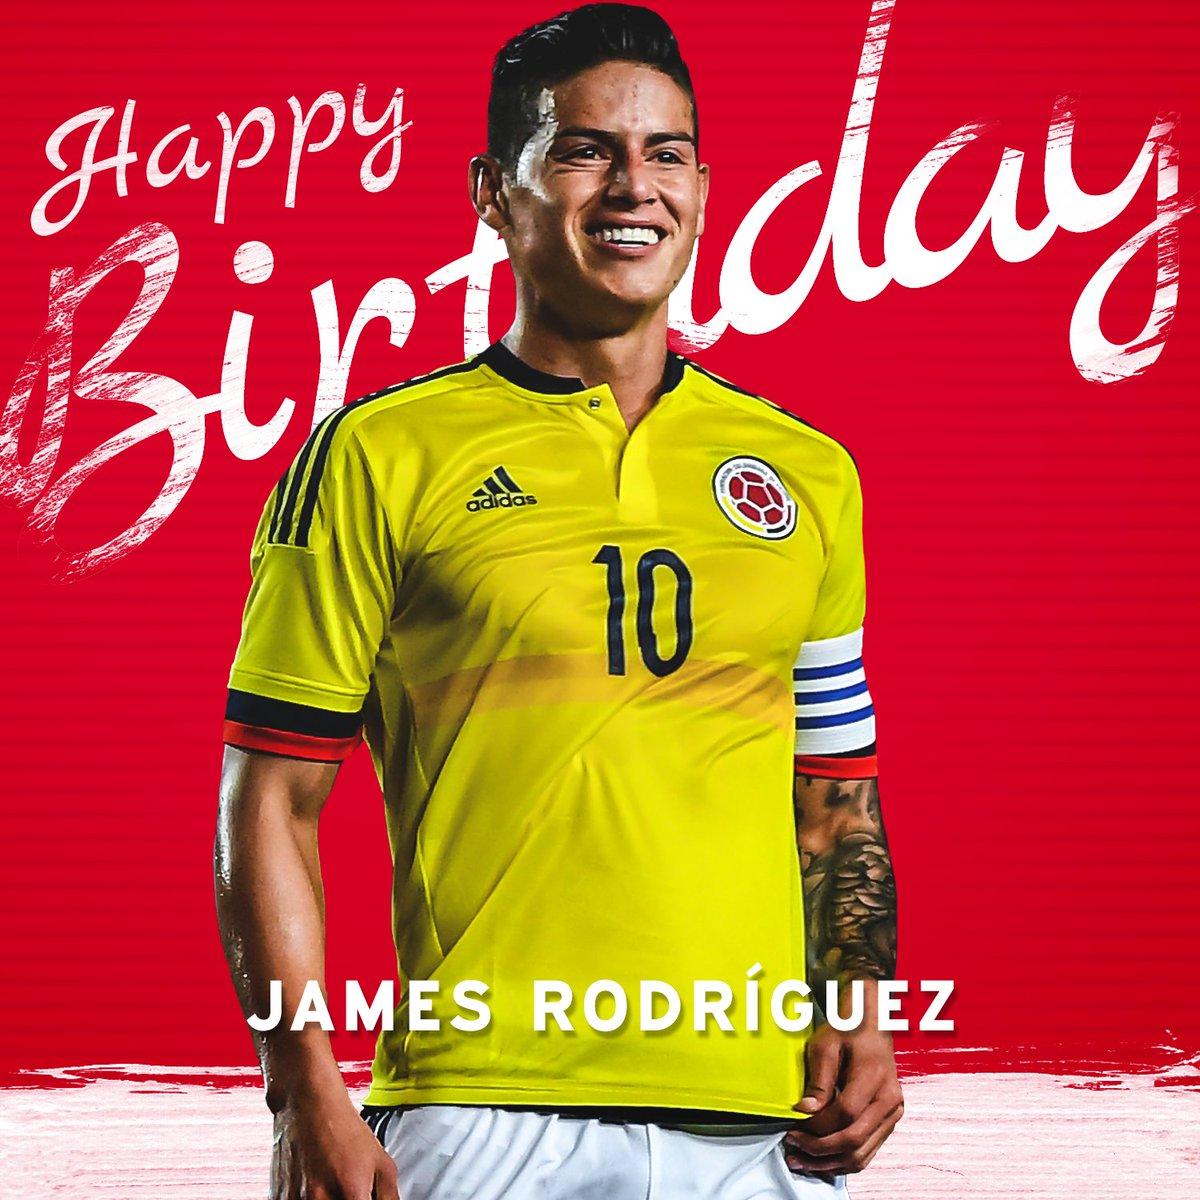 Alles Gute zum 26. Geburtstag, @jamesdrodriguez! 🎊🎂🎉 #MiaSanMia #FCBayern #ServusJames